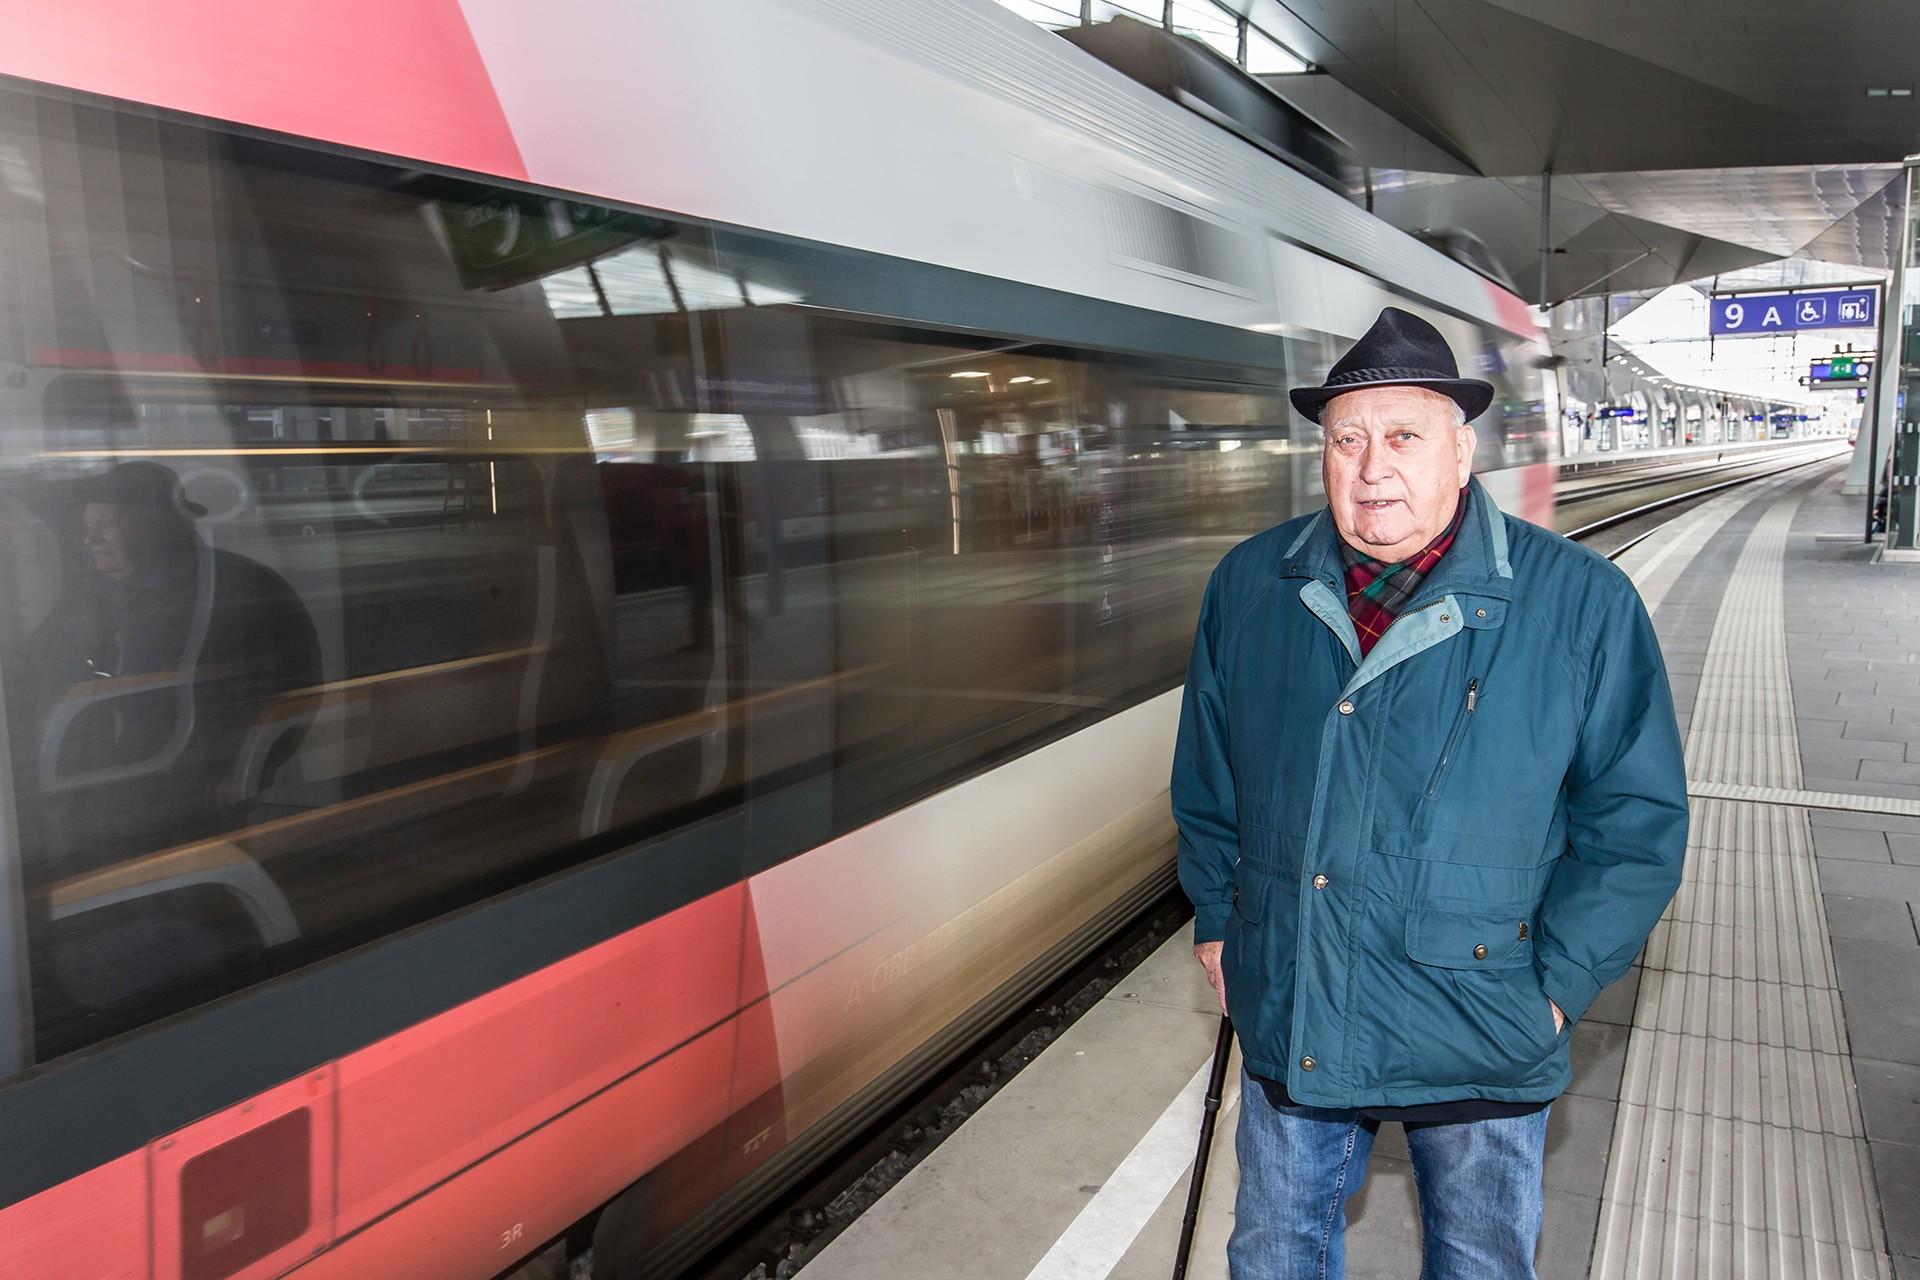 Soli957-Hauptbahnhof--_T8A7443--(C)©MichaelMazohl--1280px